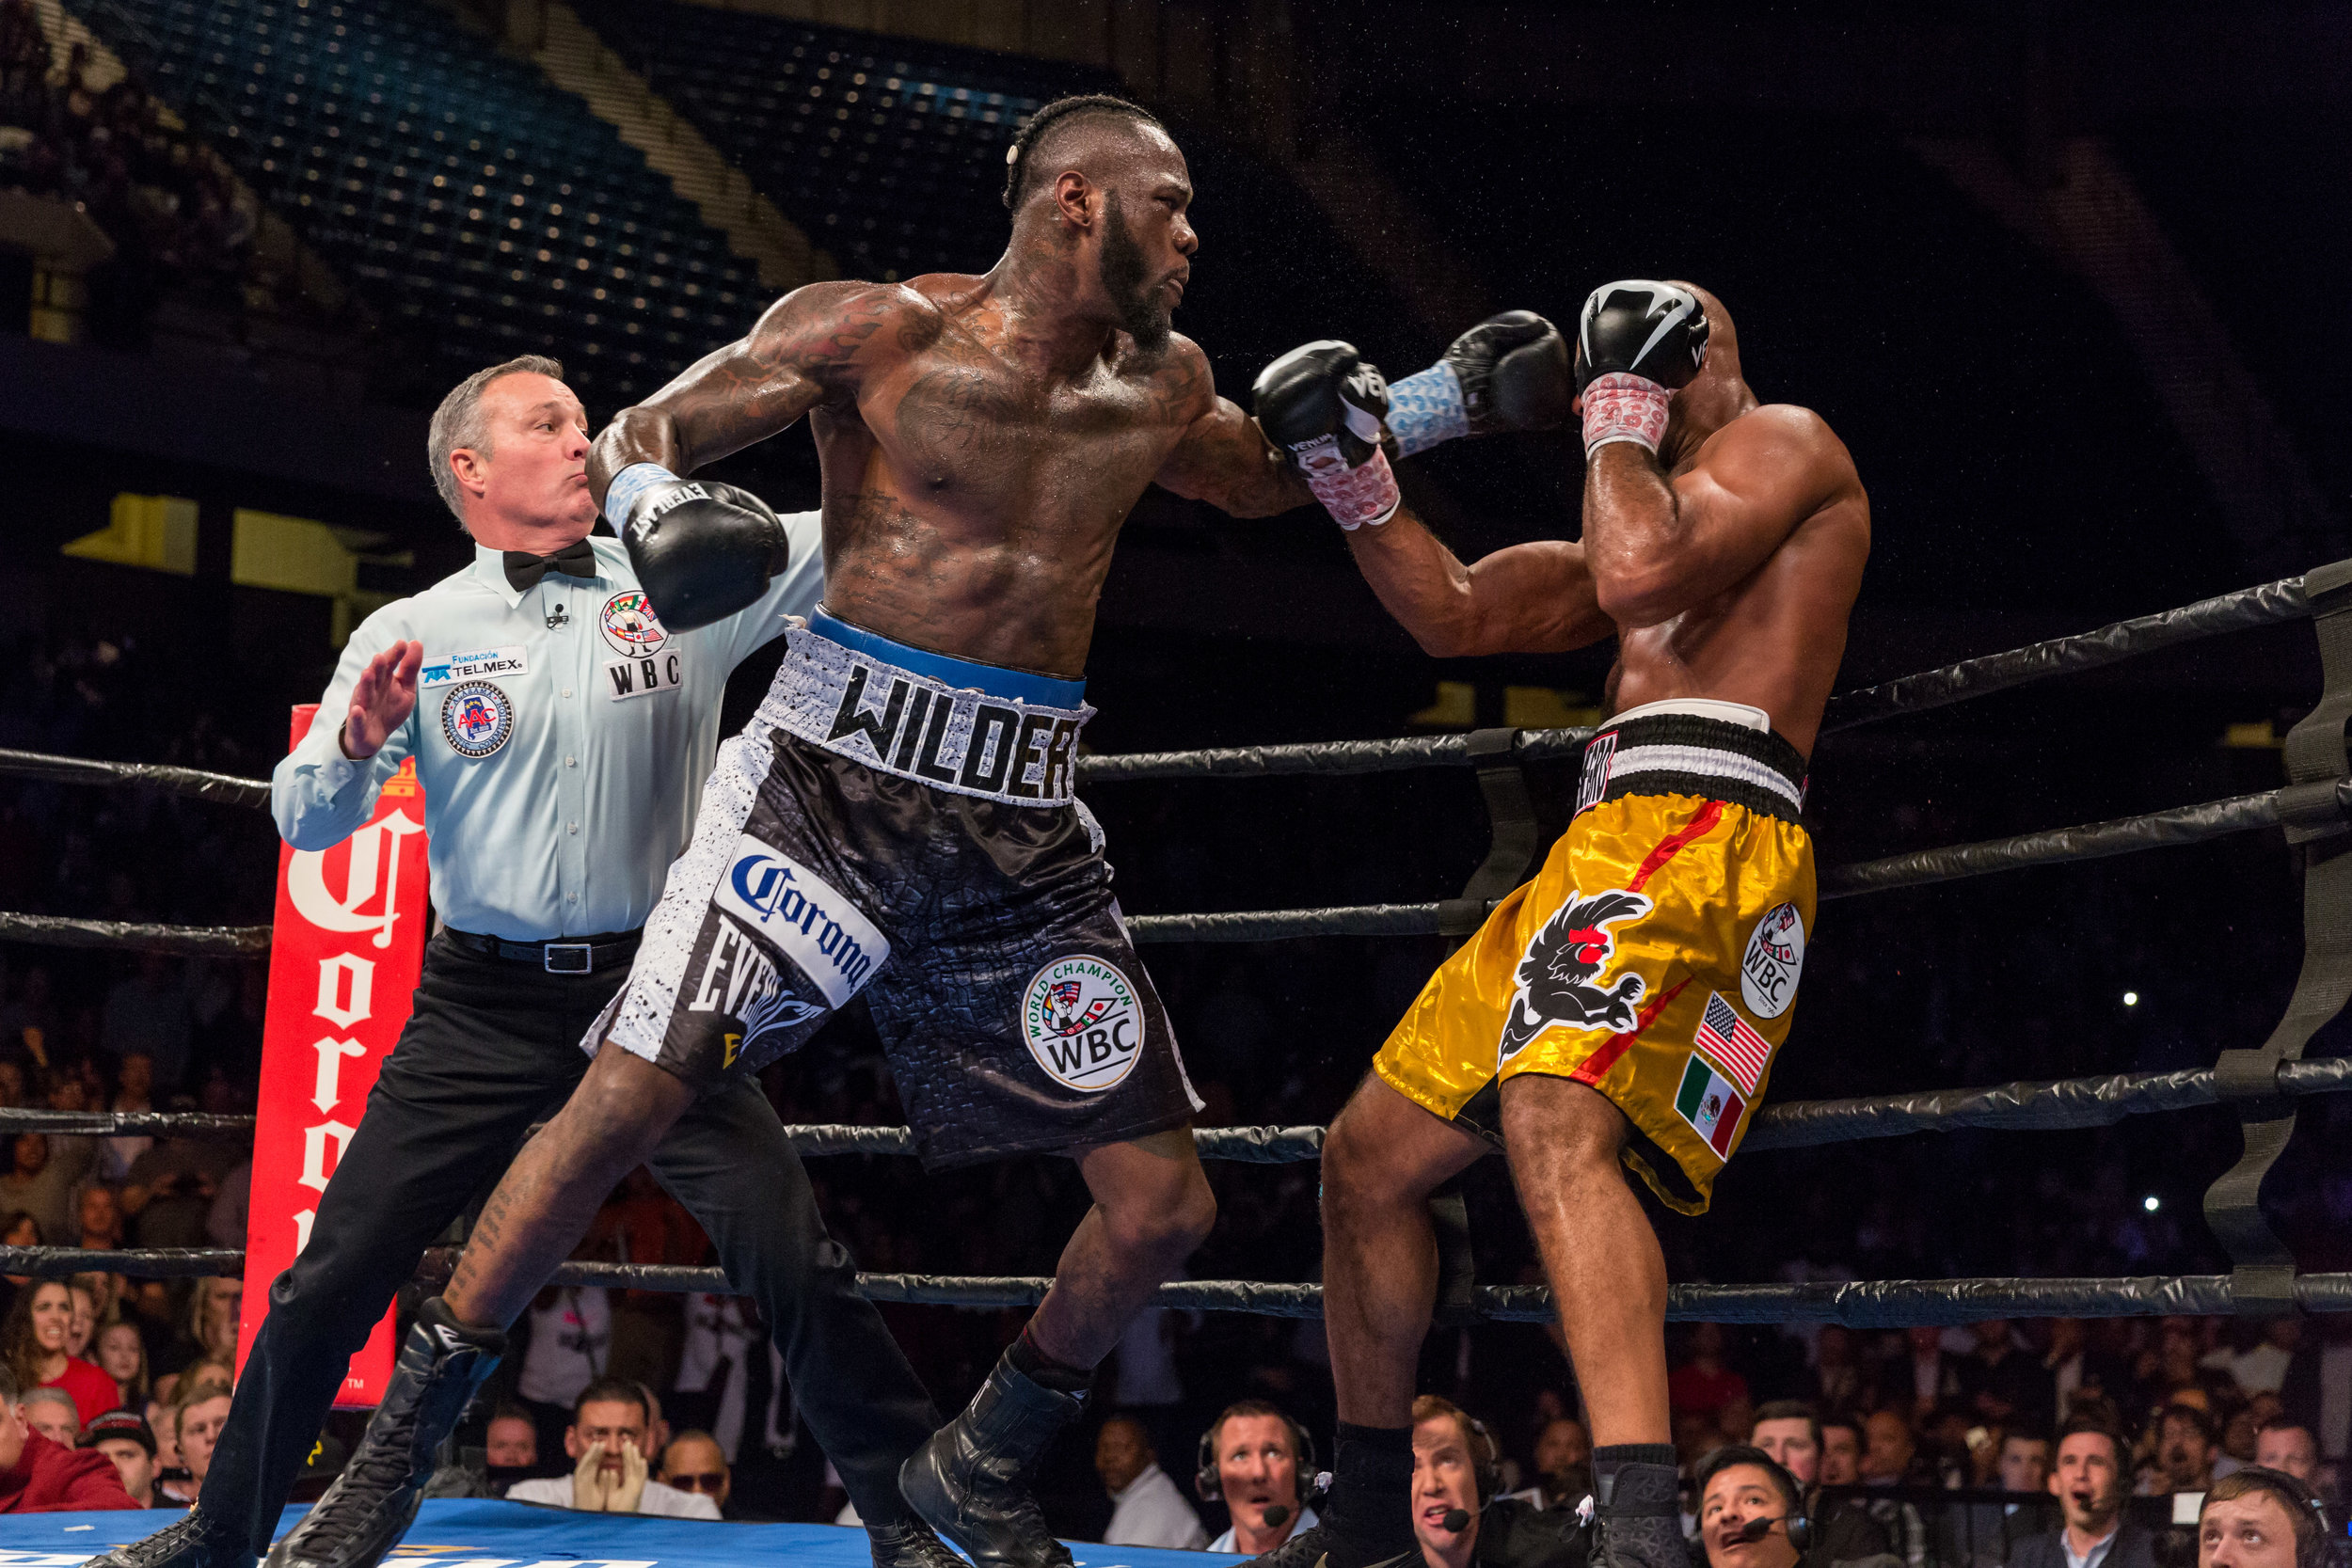 Deontay Wilder vs Gerald Washington - February 25_ 2017_02_25_2017_Fight_Ryan Hafey _ Premier Boxing Champions14.jpg